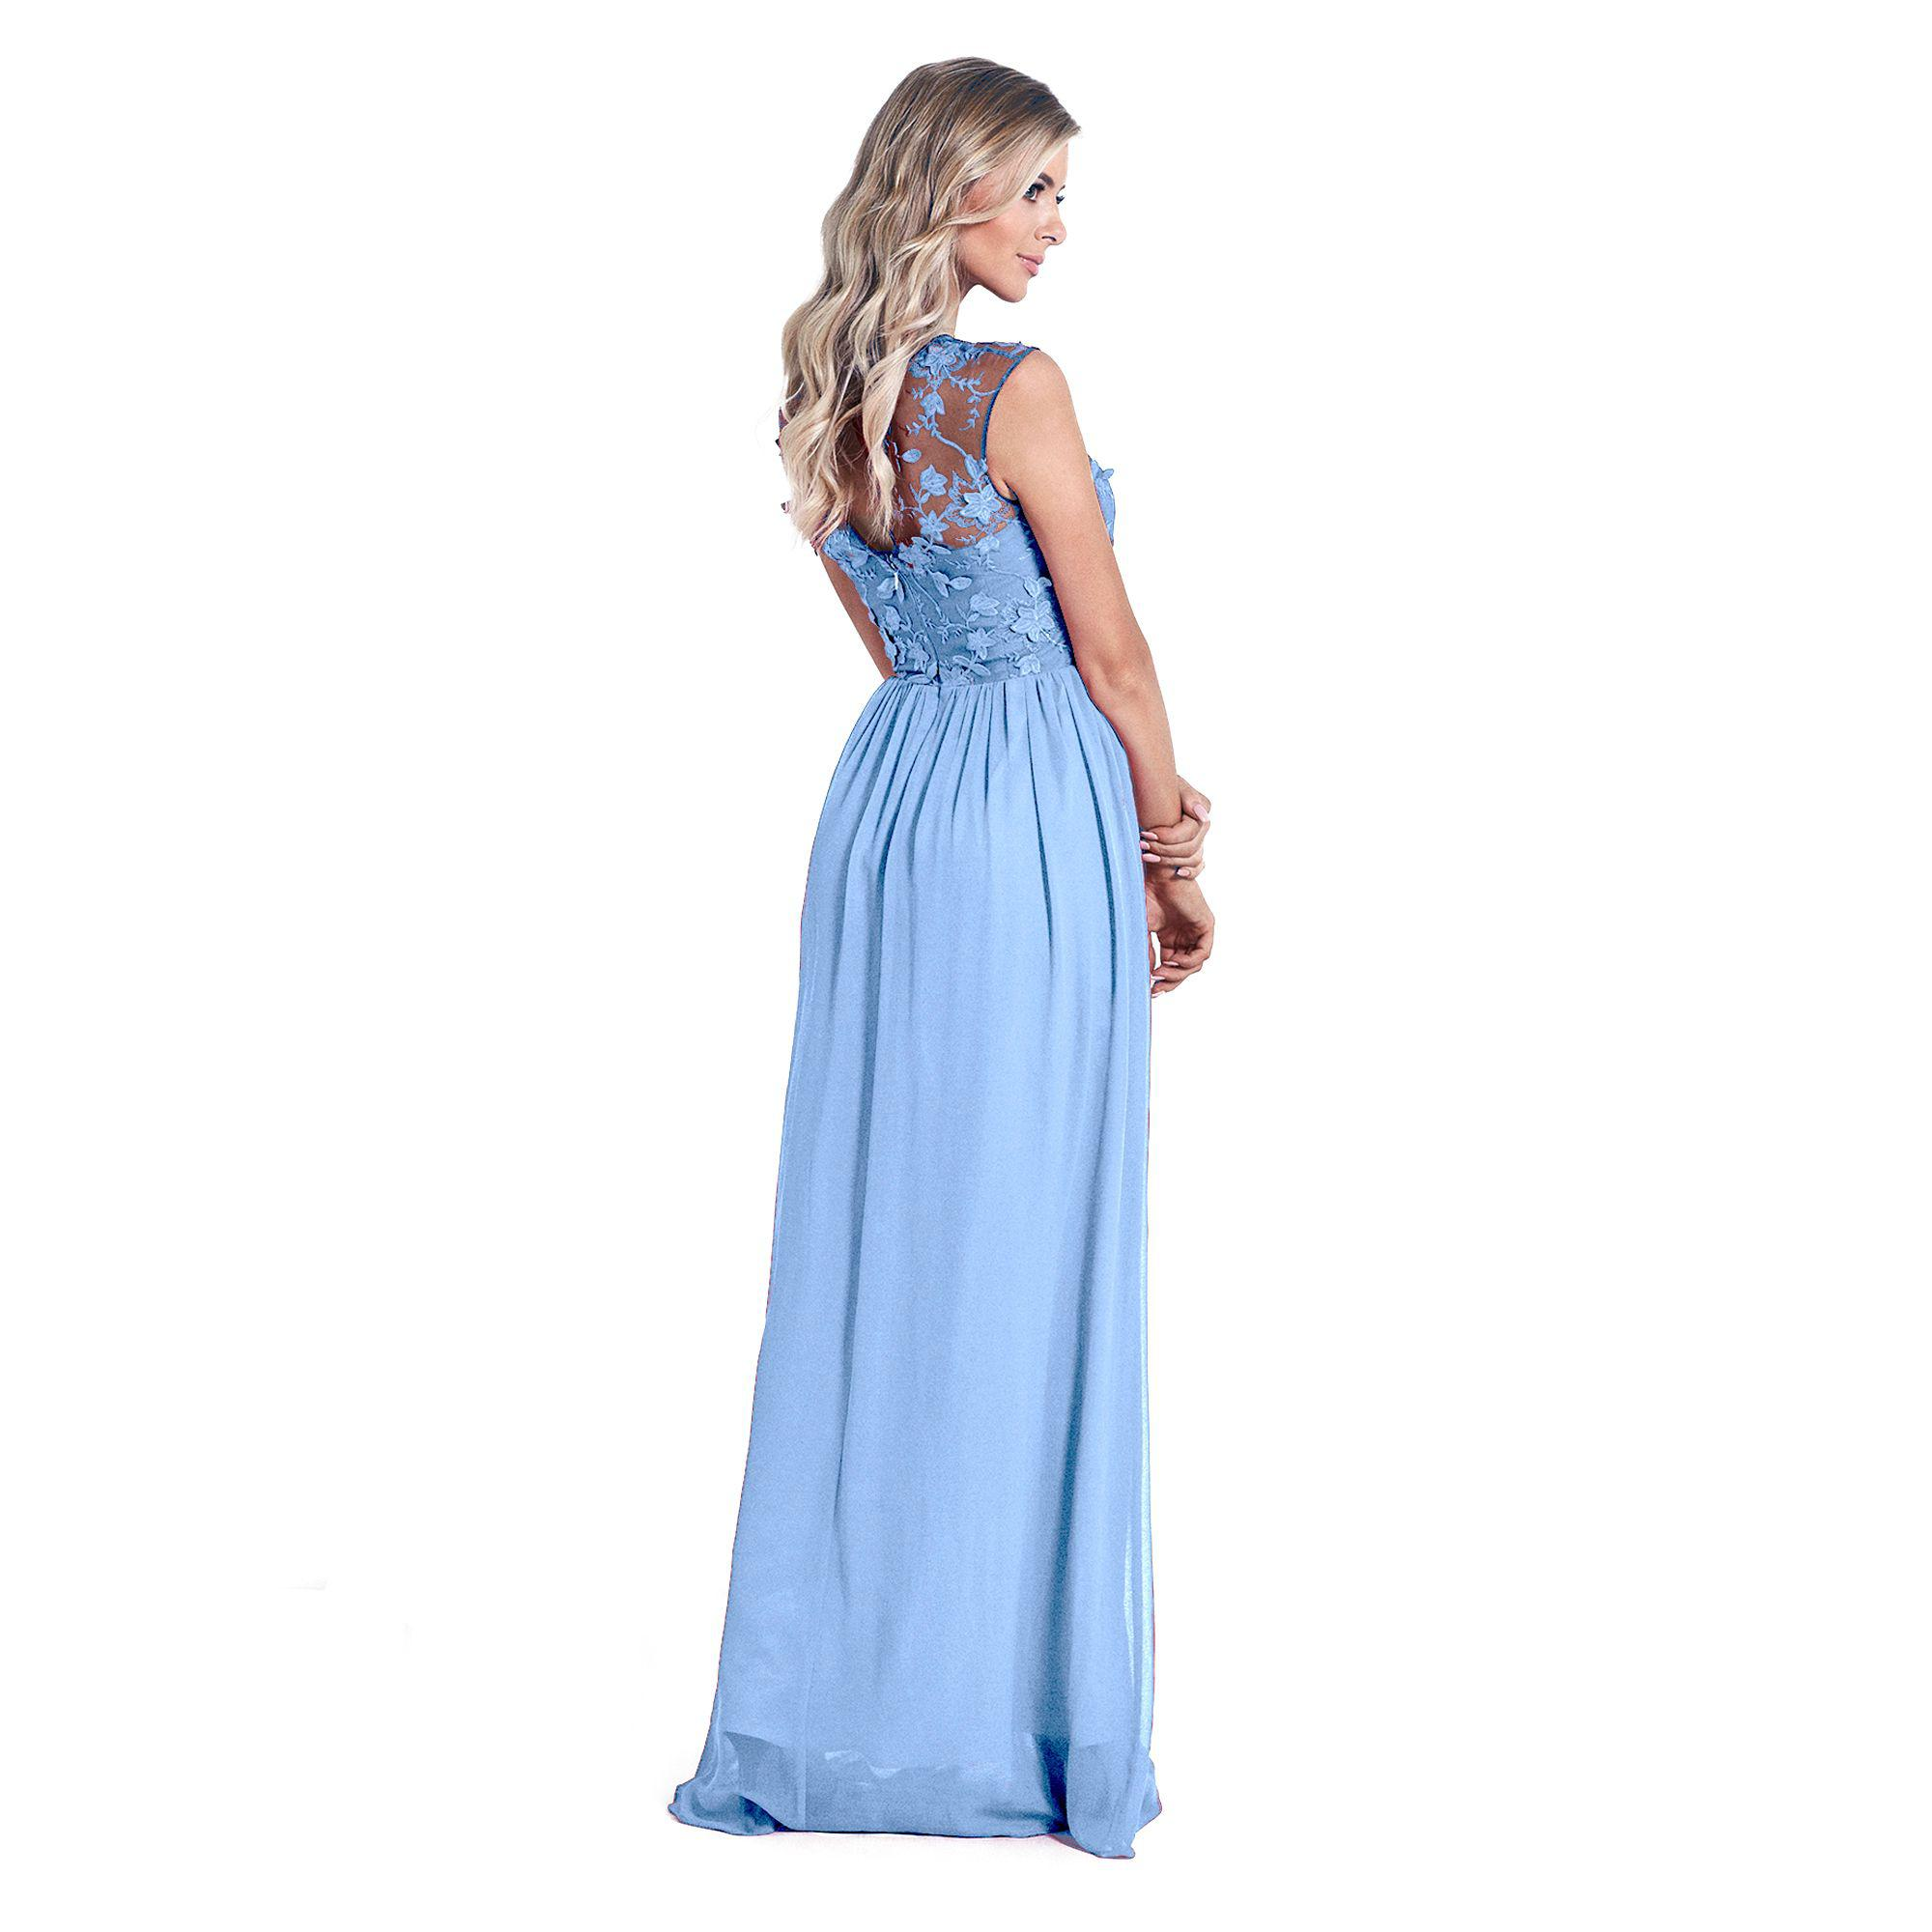 Lipstick Boutique Powder Blue 'beverley' Lace Bridesmaid Maxi Dress